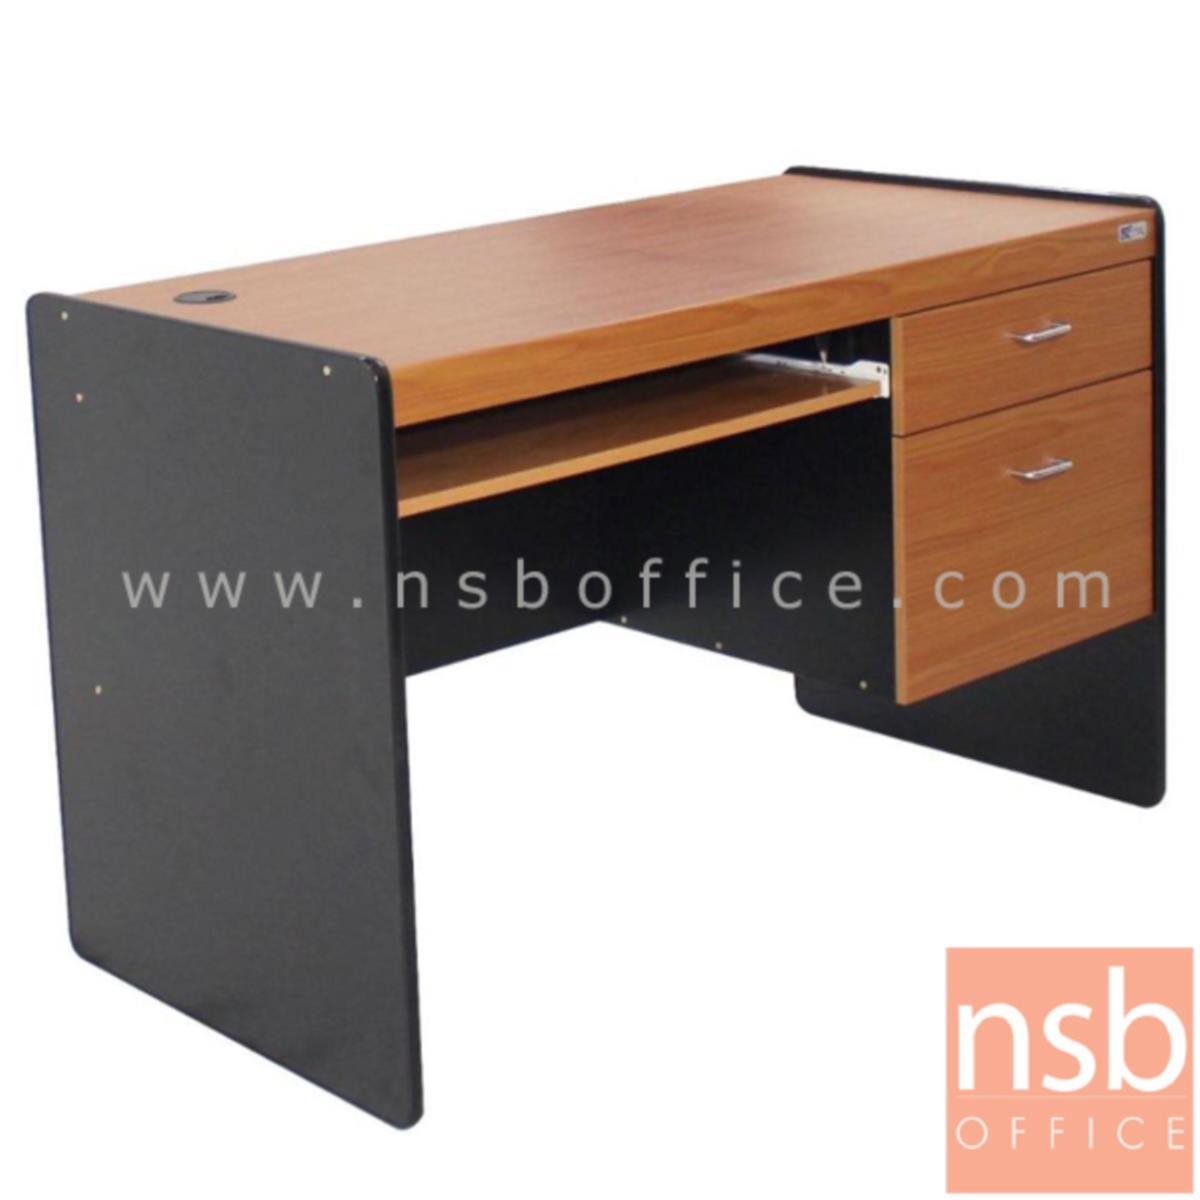 A02A003:โต๊ะคอมพิวเตอร์ 2 ลิ้นชัก  รุ่น Mindless (ไมนด์เลส) ขนาด 100W ,120W cm. พร้อมรางคีบอร์ดและกุญแจล็อค